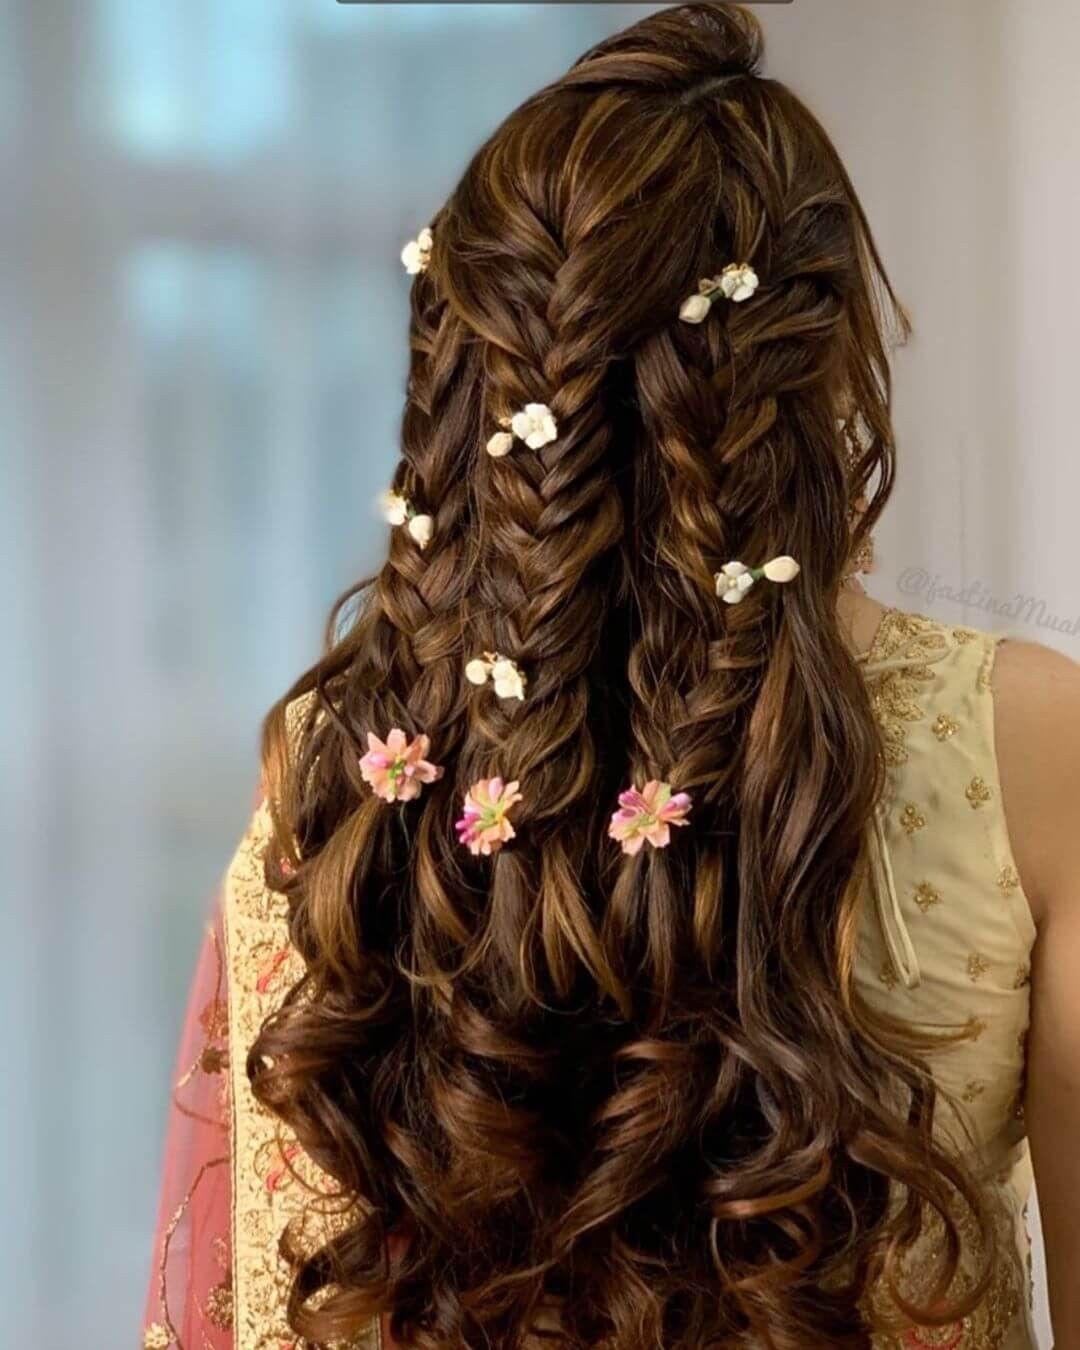 Pin by Srishti Kundra on Messy bun | Hair styles, Braided hairstyles,  Indian wedding hairstyles